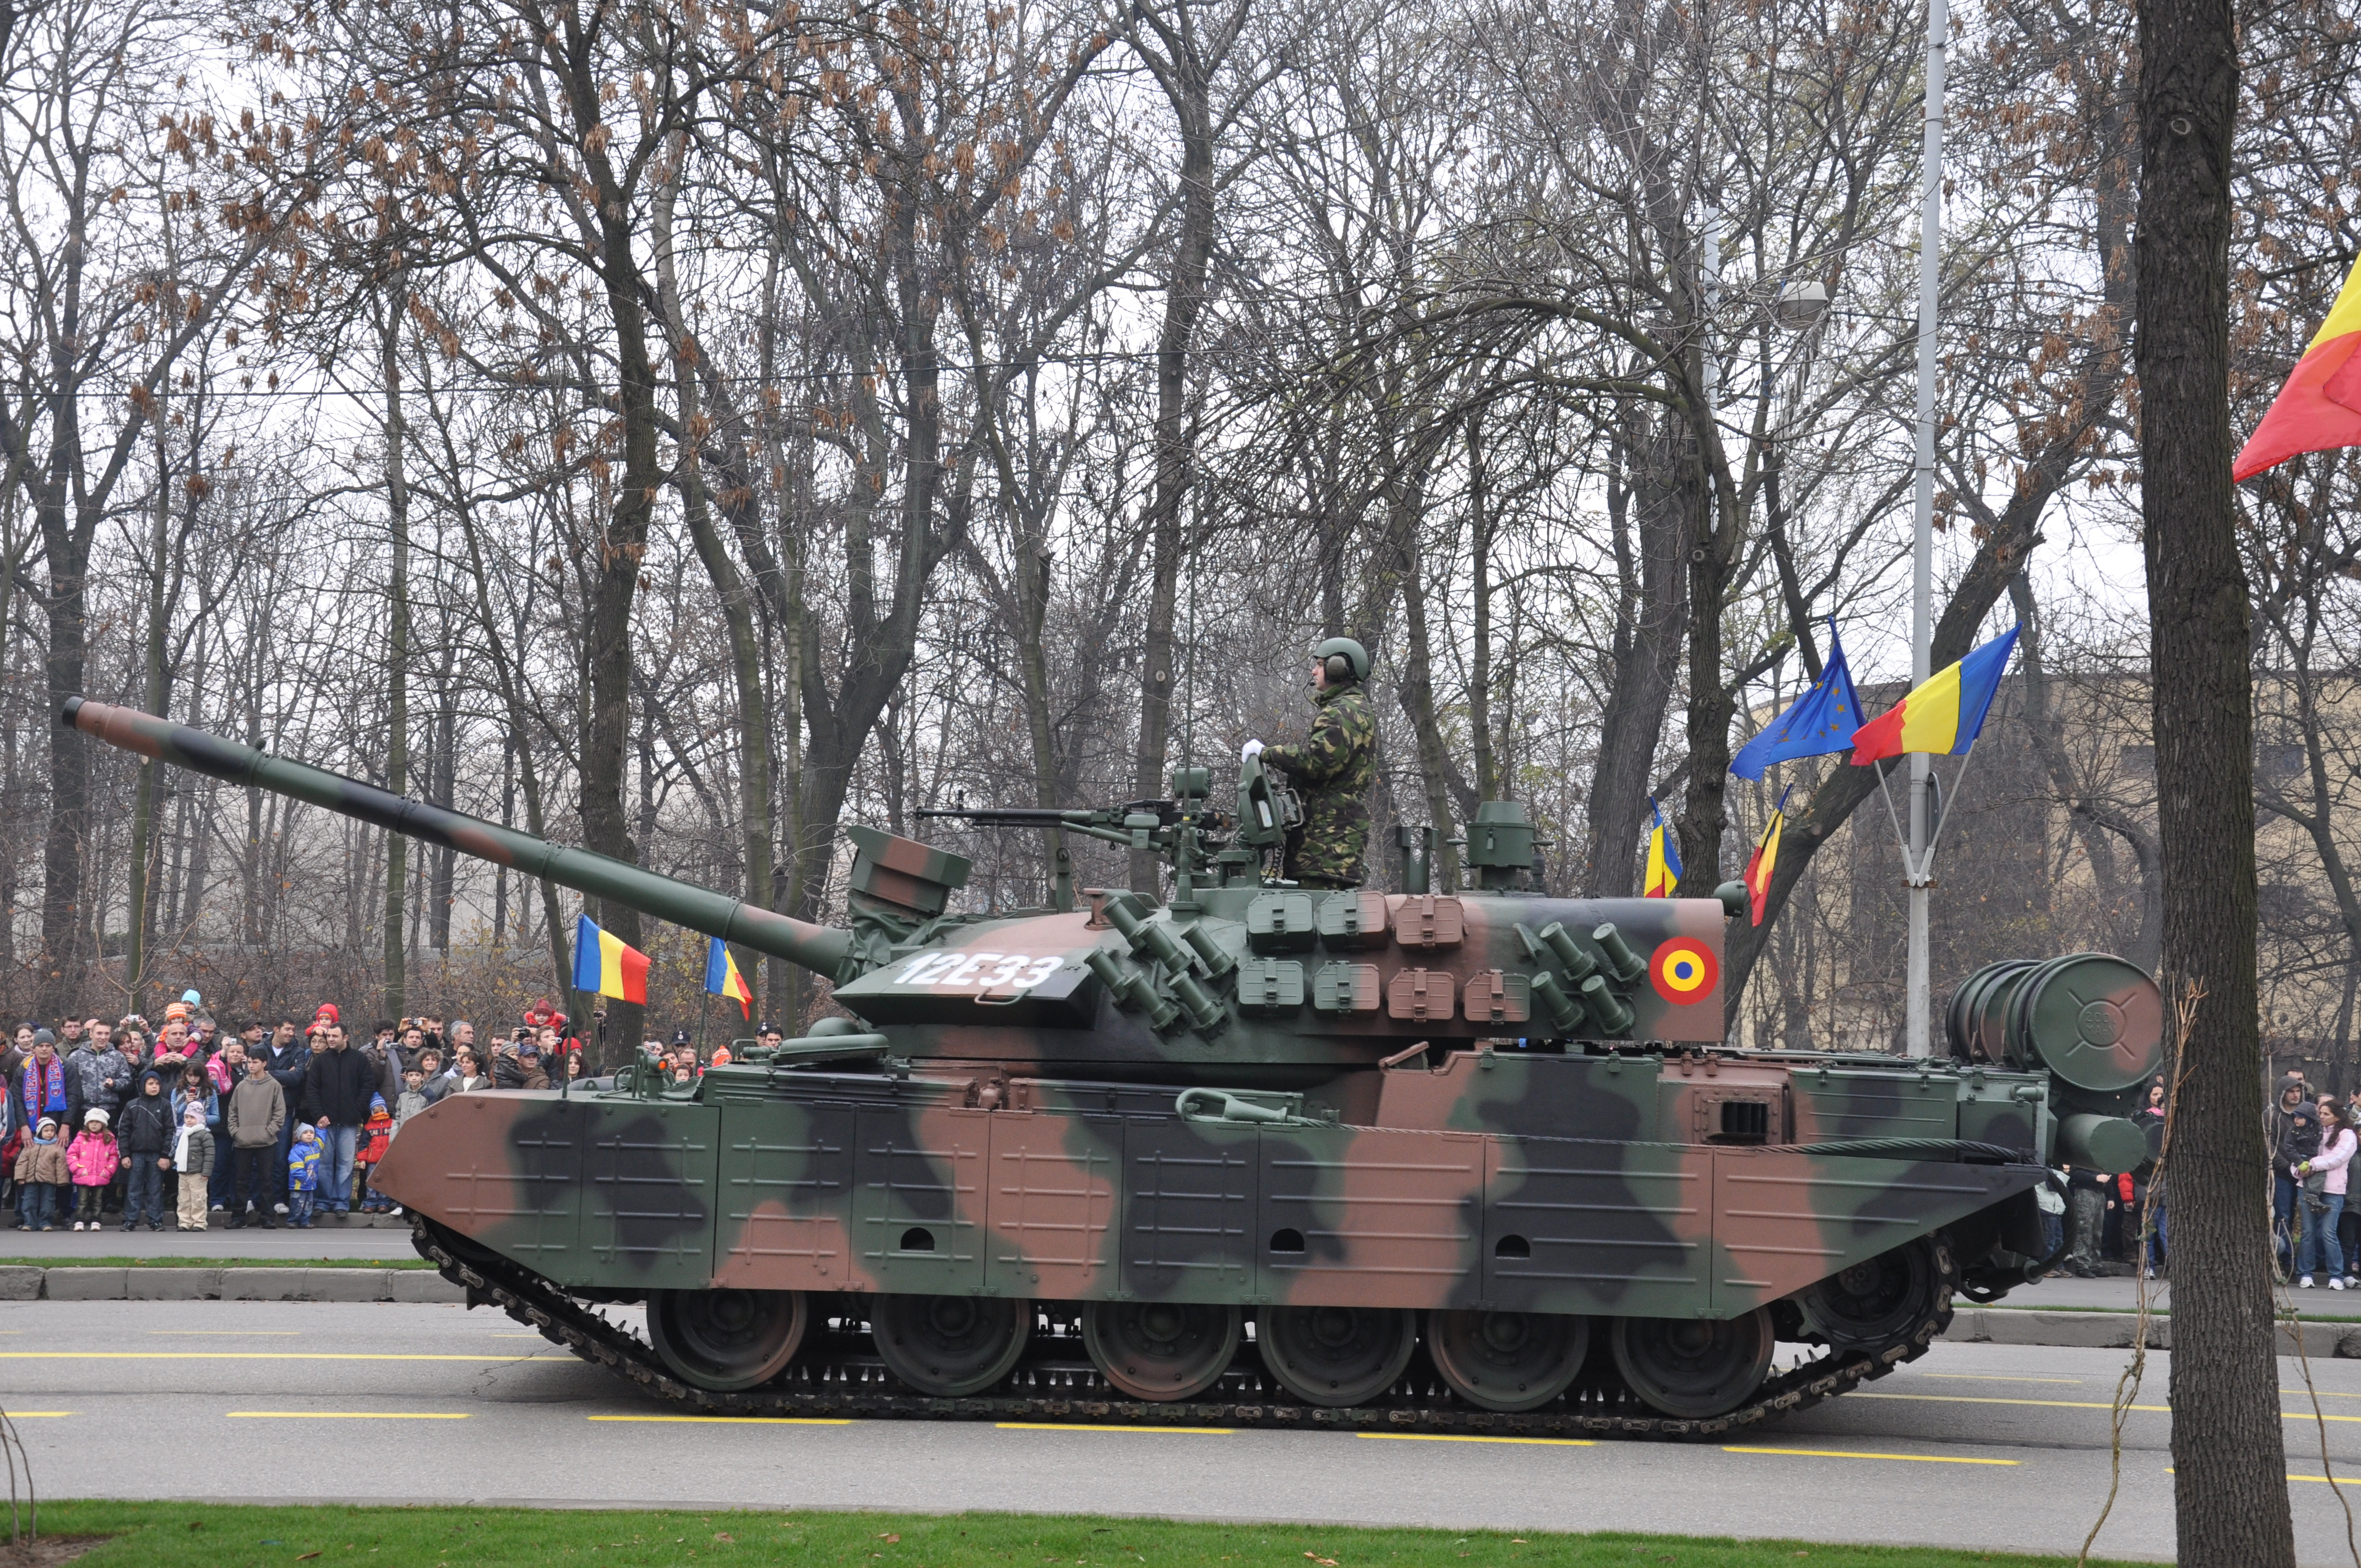 File:Romanian Tank TR-85M1 - 01.jpg - Wikimedia Commons